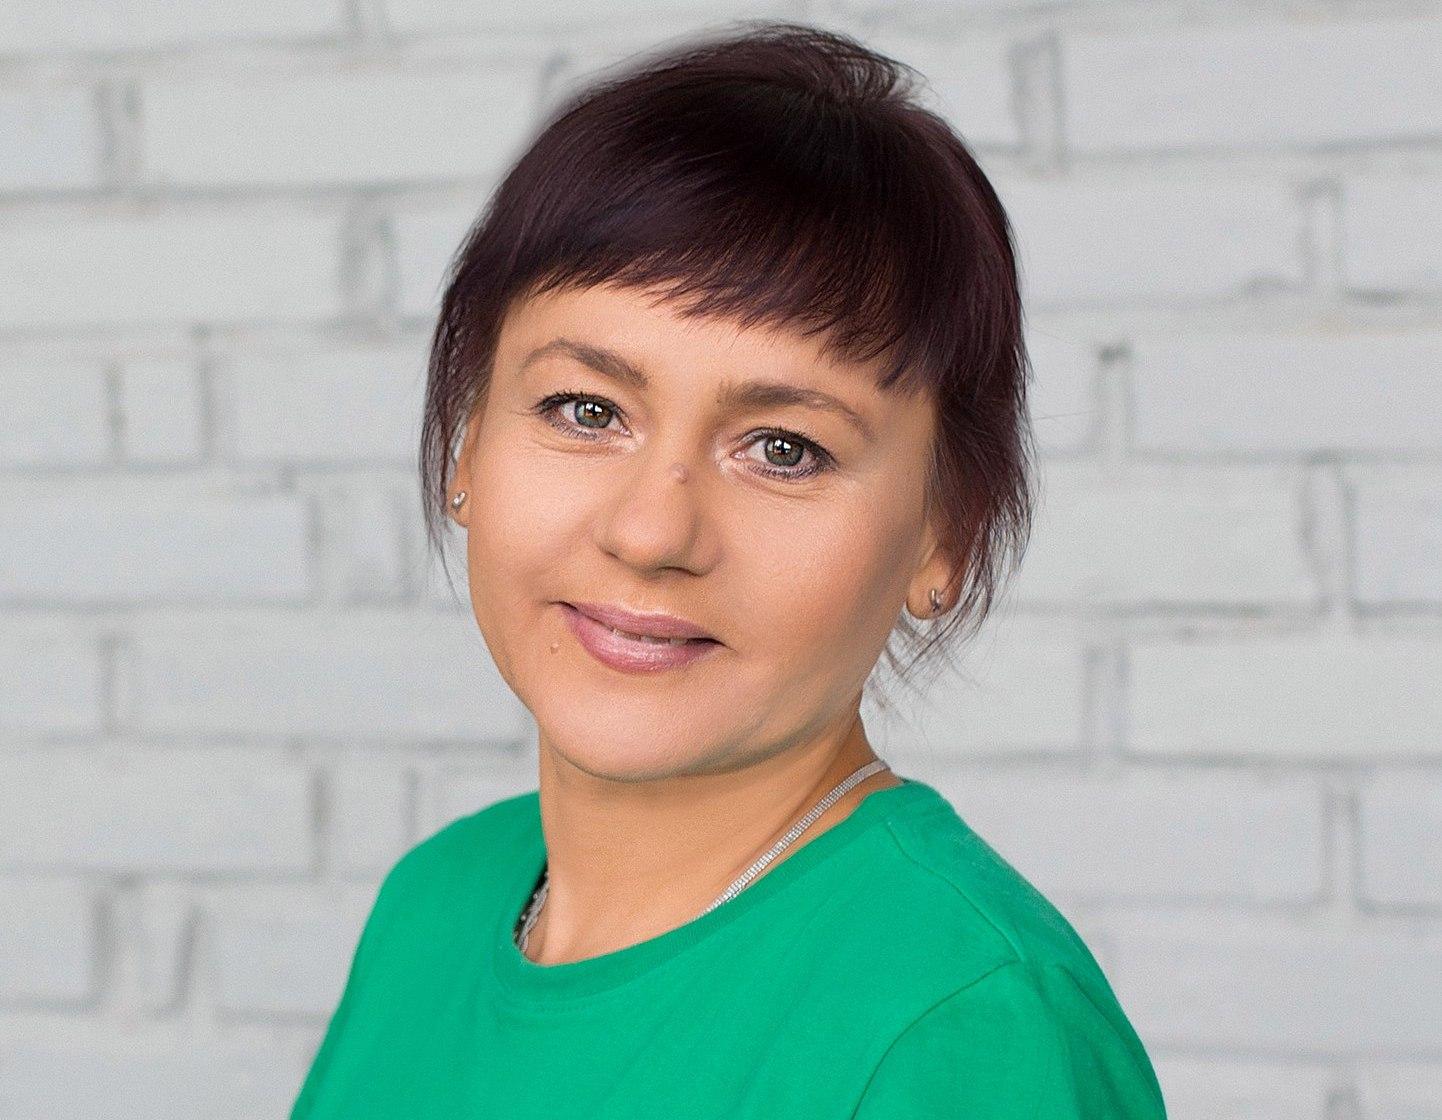 Знакомьтесь Ирина Красавина